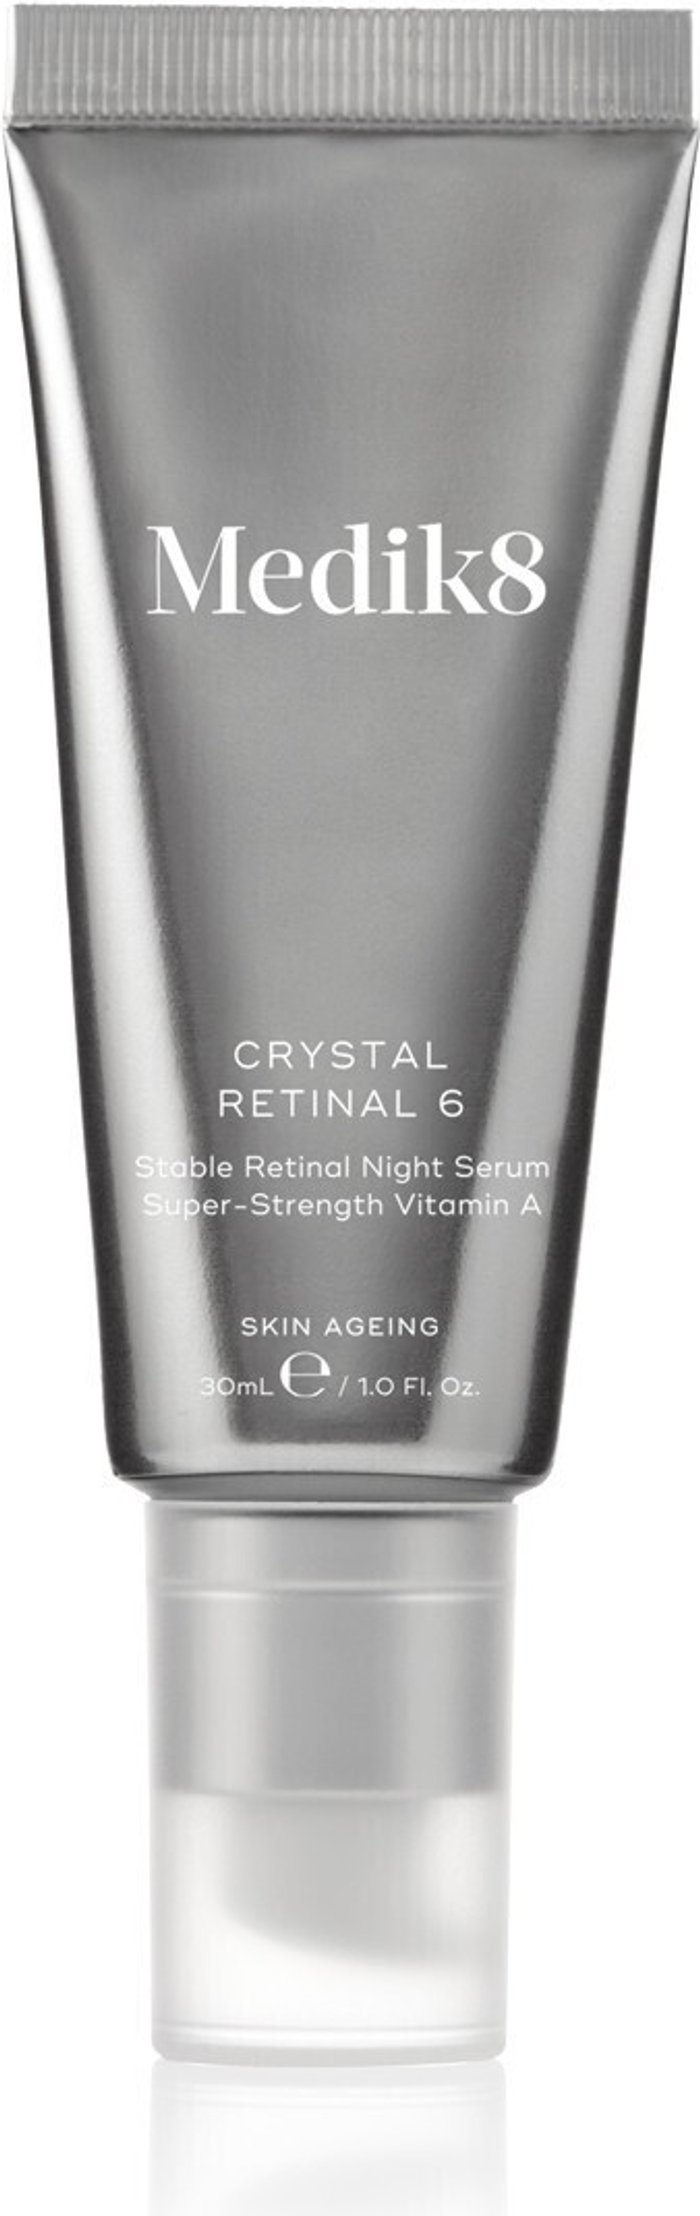 Medik8 Medik8 Crystal Retinal 6 (30ml)